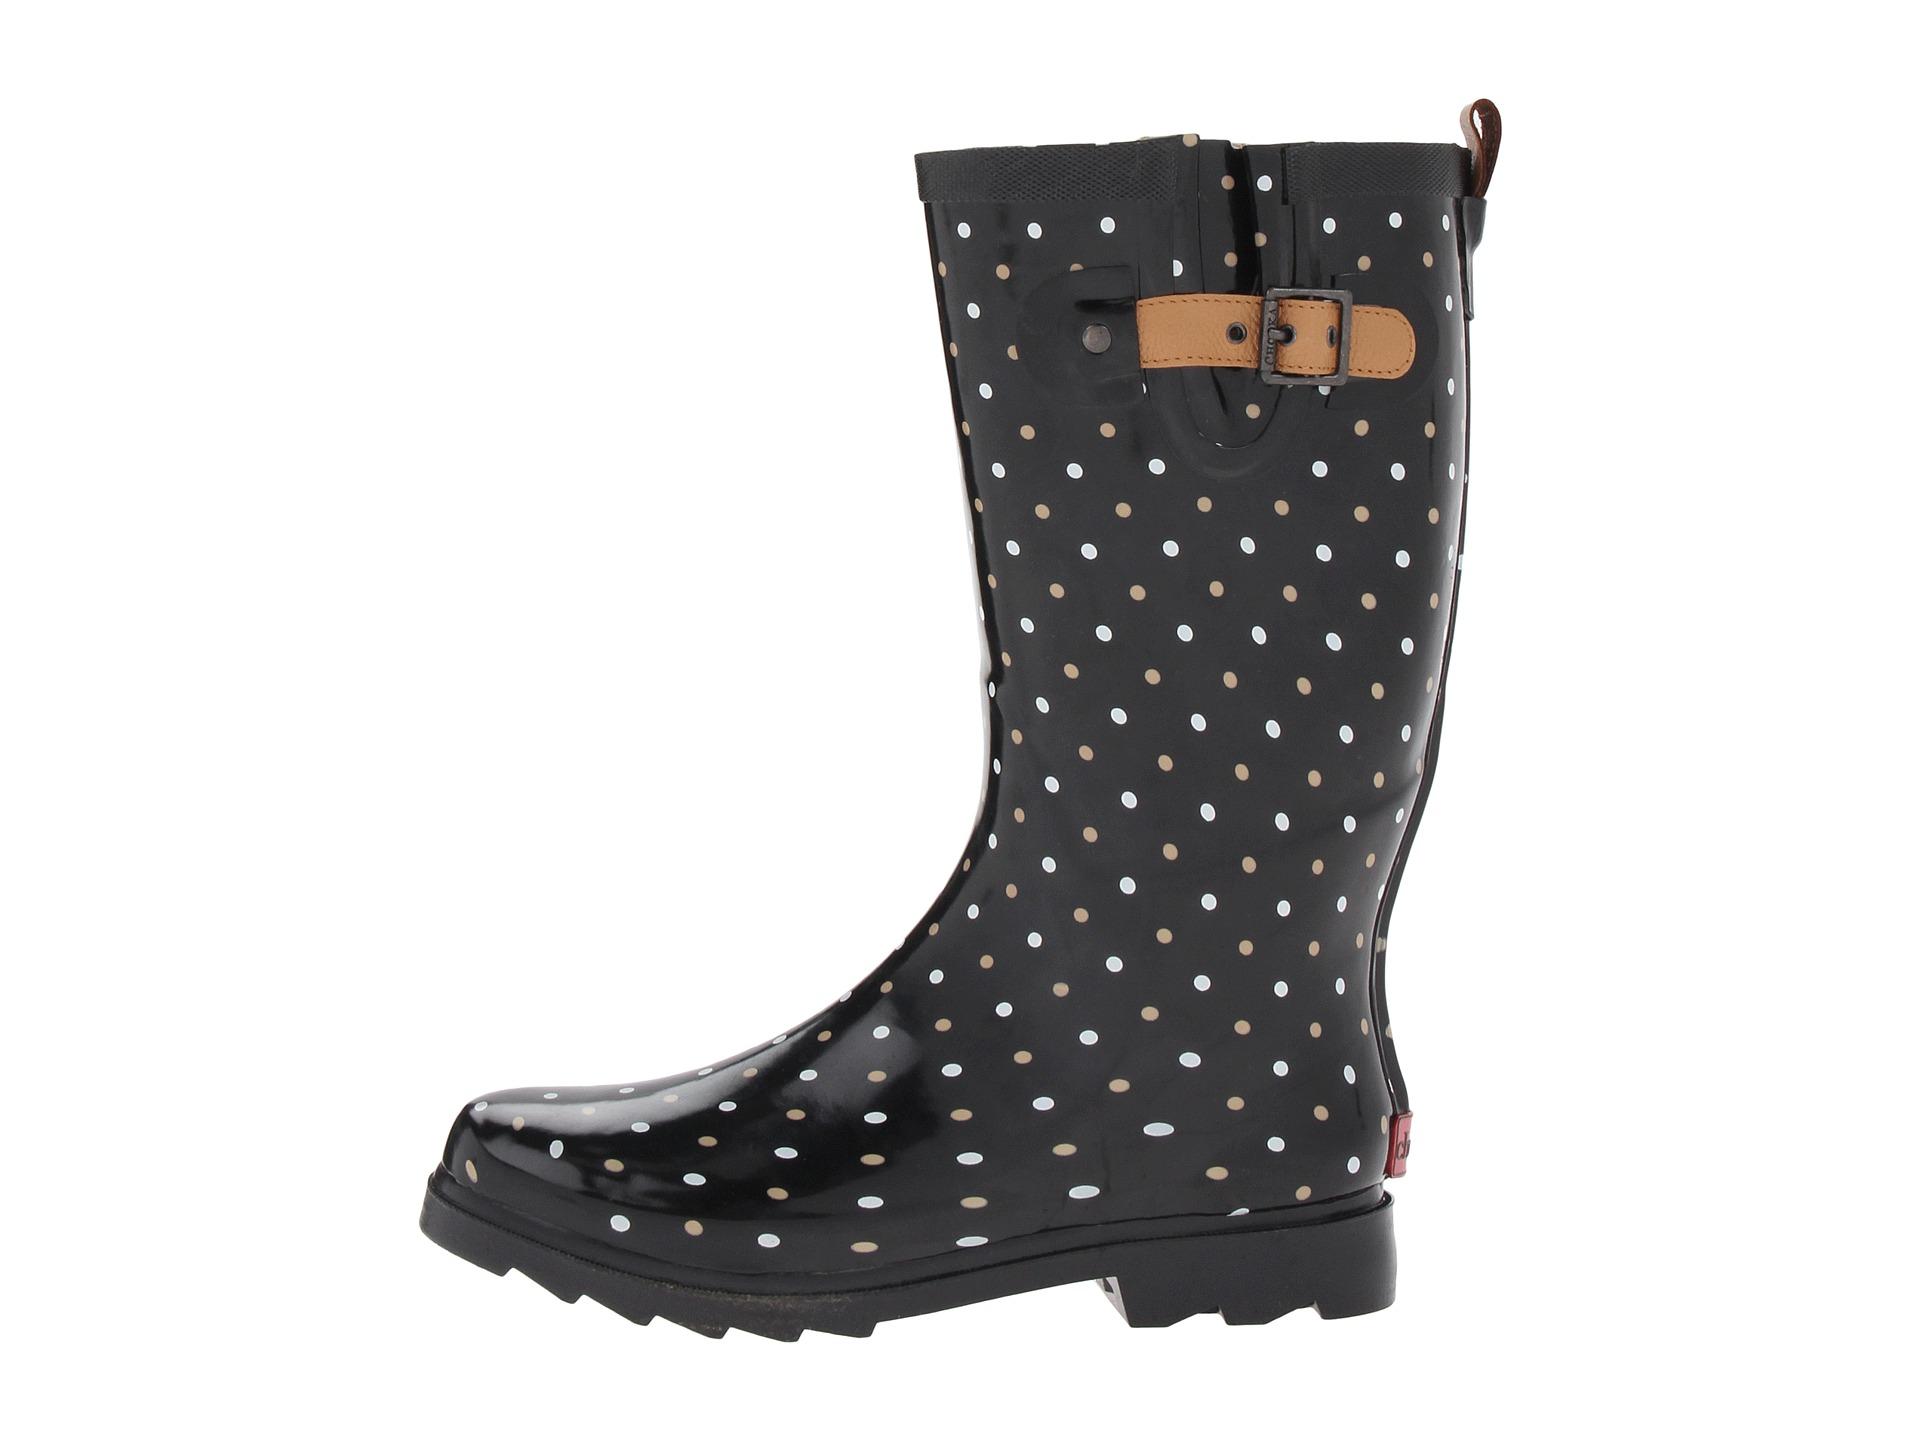 chooka rain boots chooka classic dot rain boot at zappos.com FAWQRMX